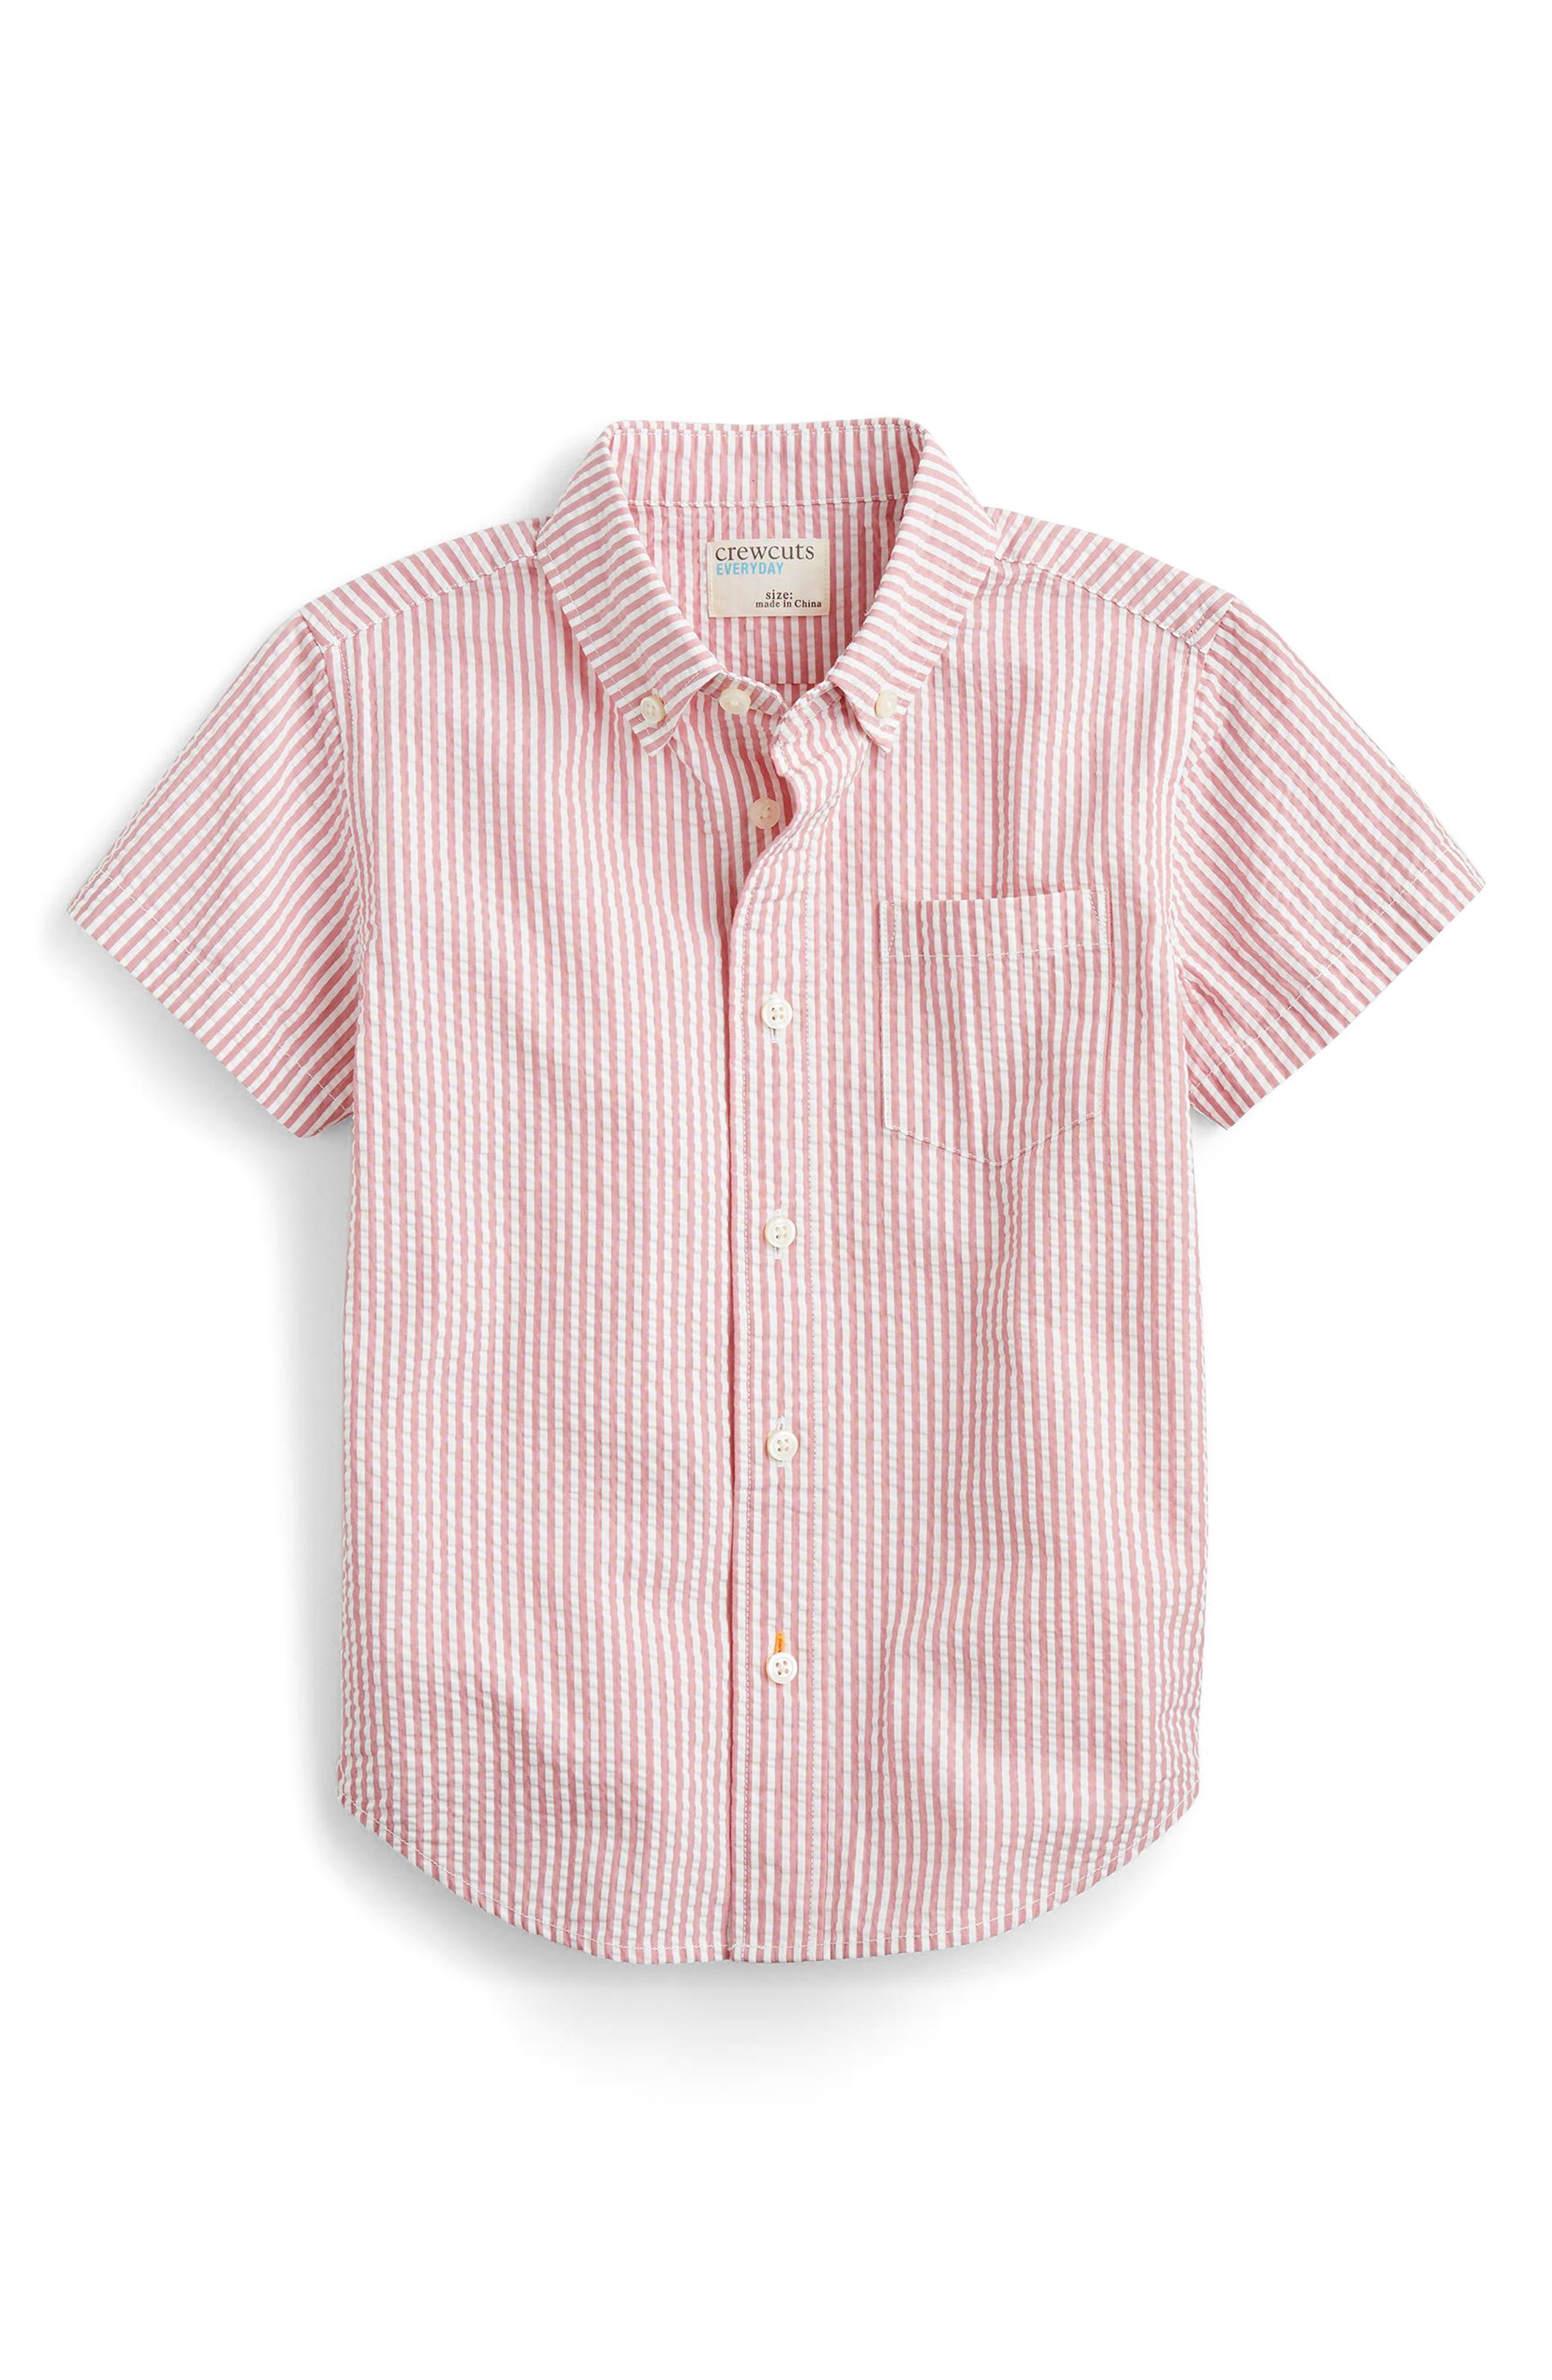 Seersucker Shirt,                         Main,                         color, Vintage Pink